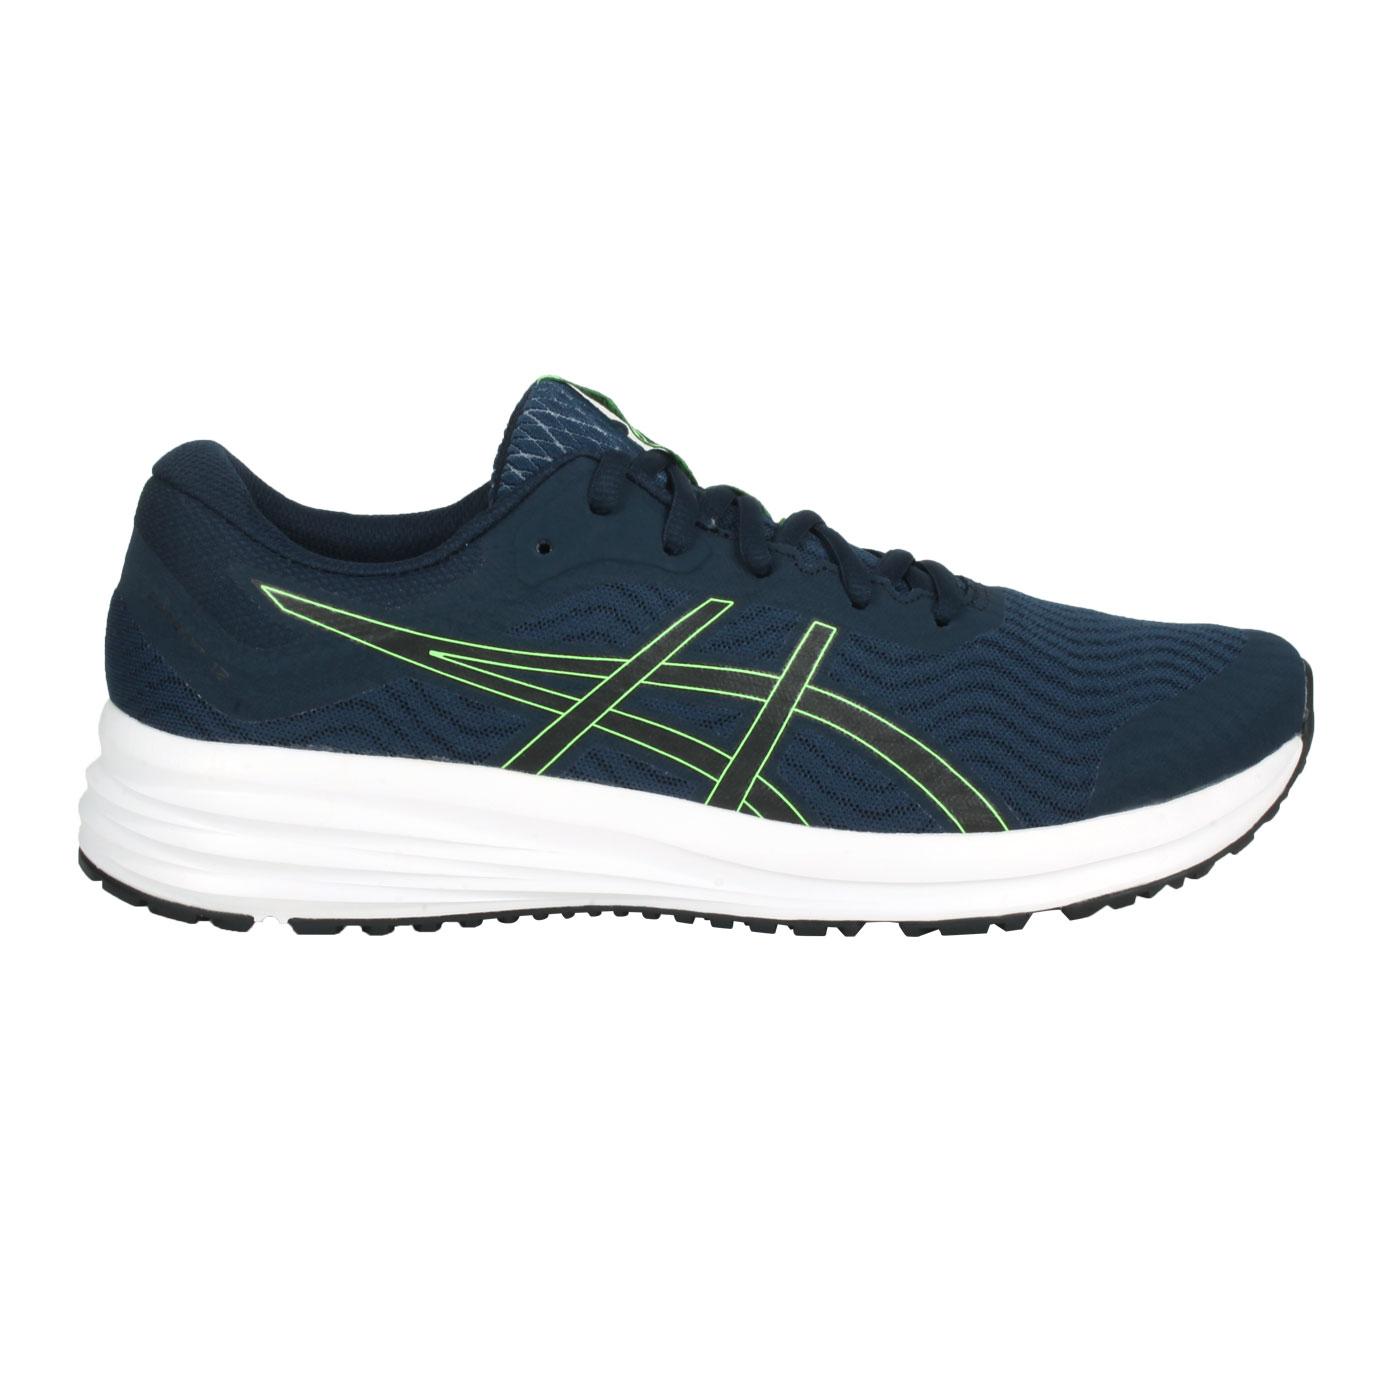 ASICS 男款慢跑鞋  @PATRIOT 12@1011A823-407 - 丈青螢光綠